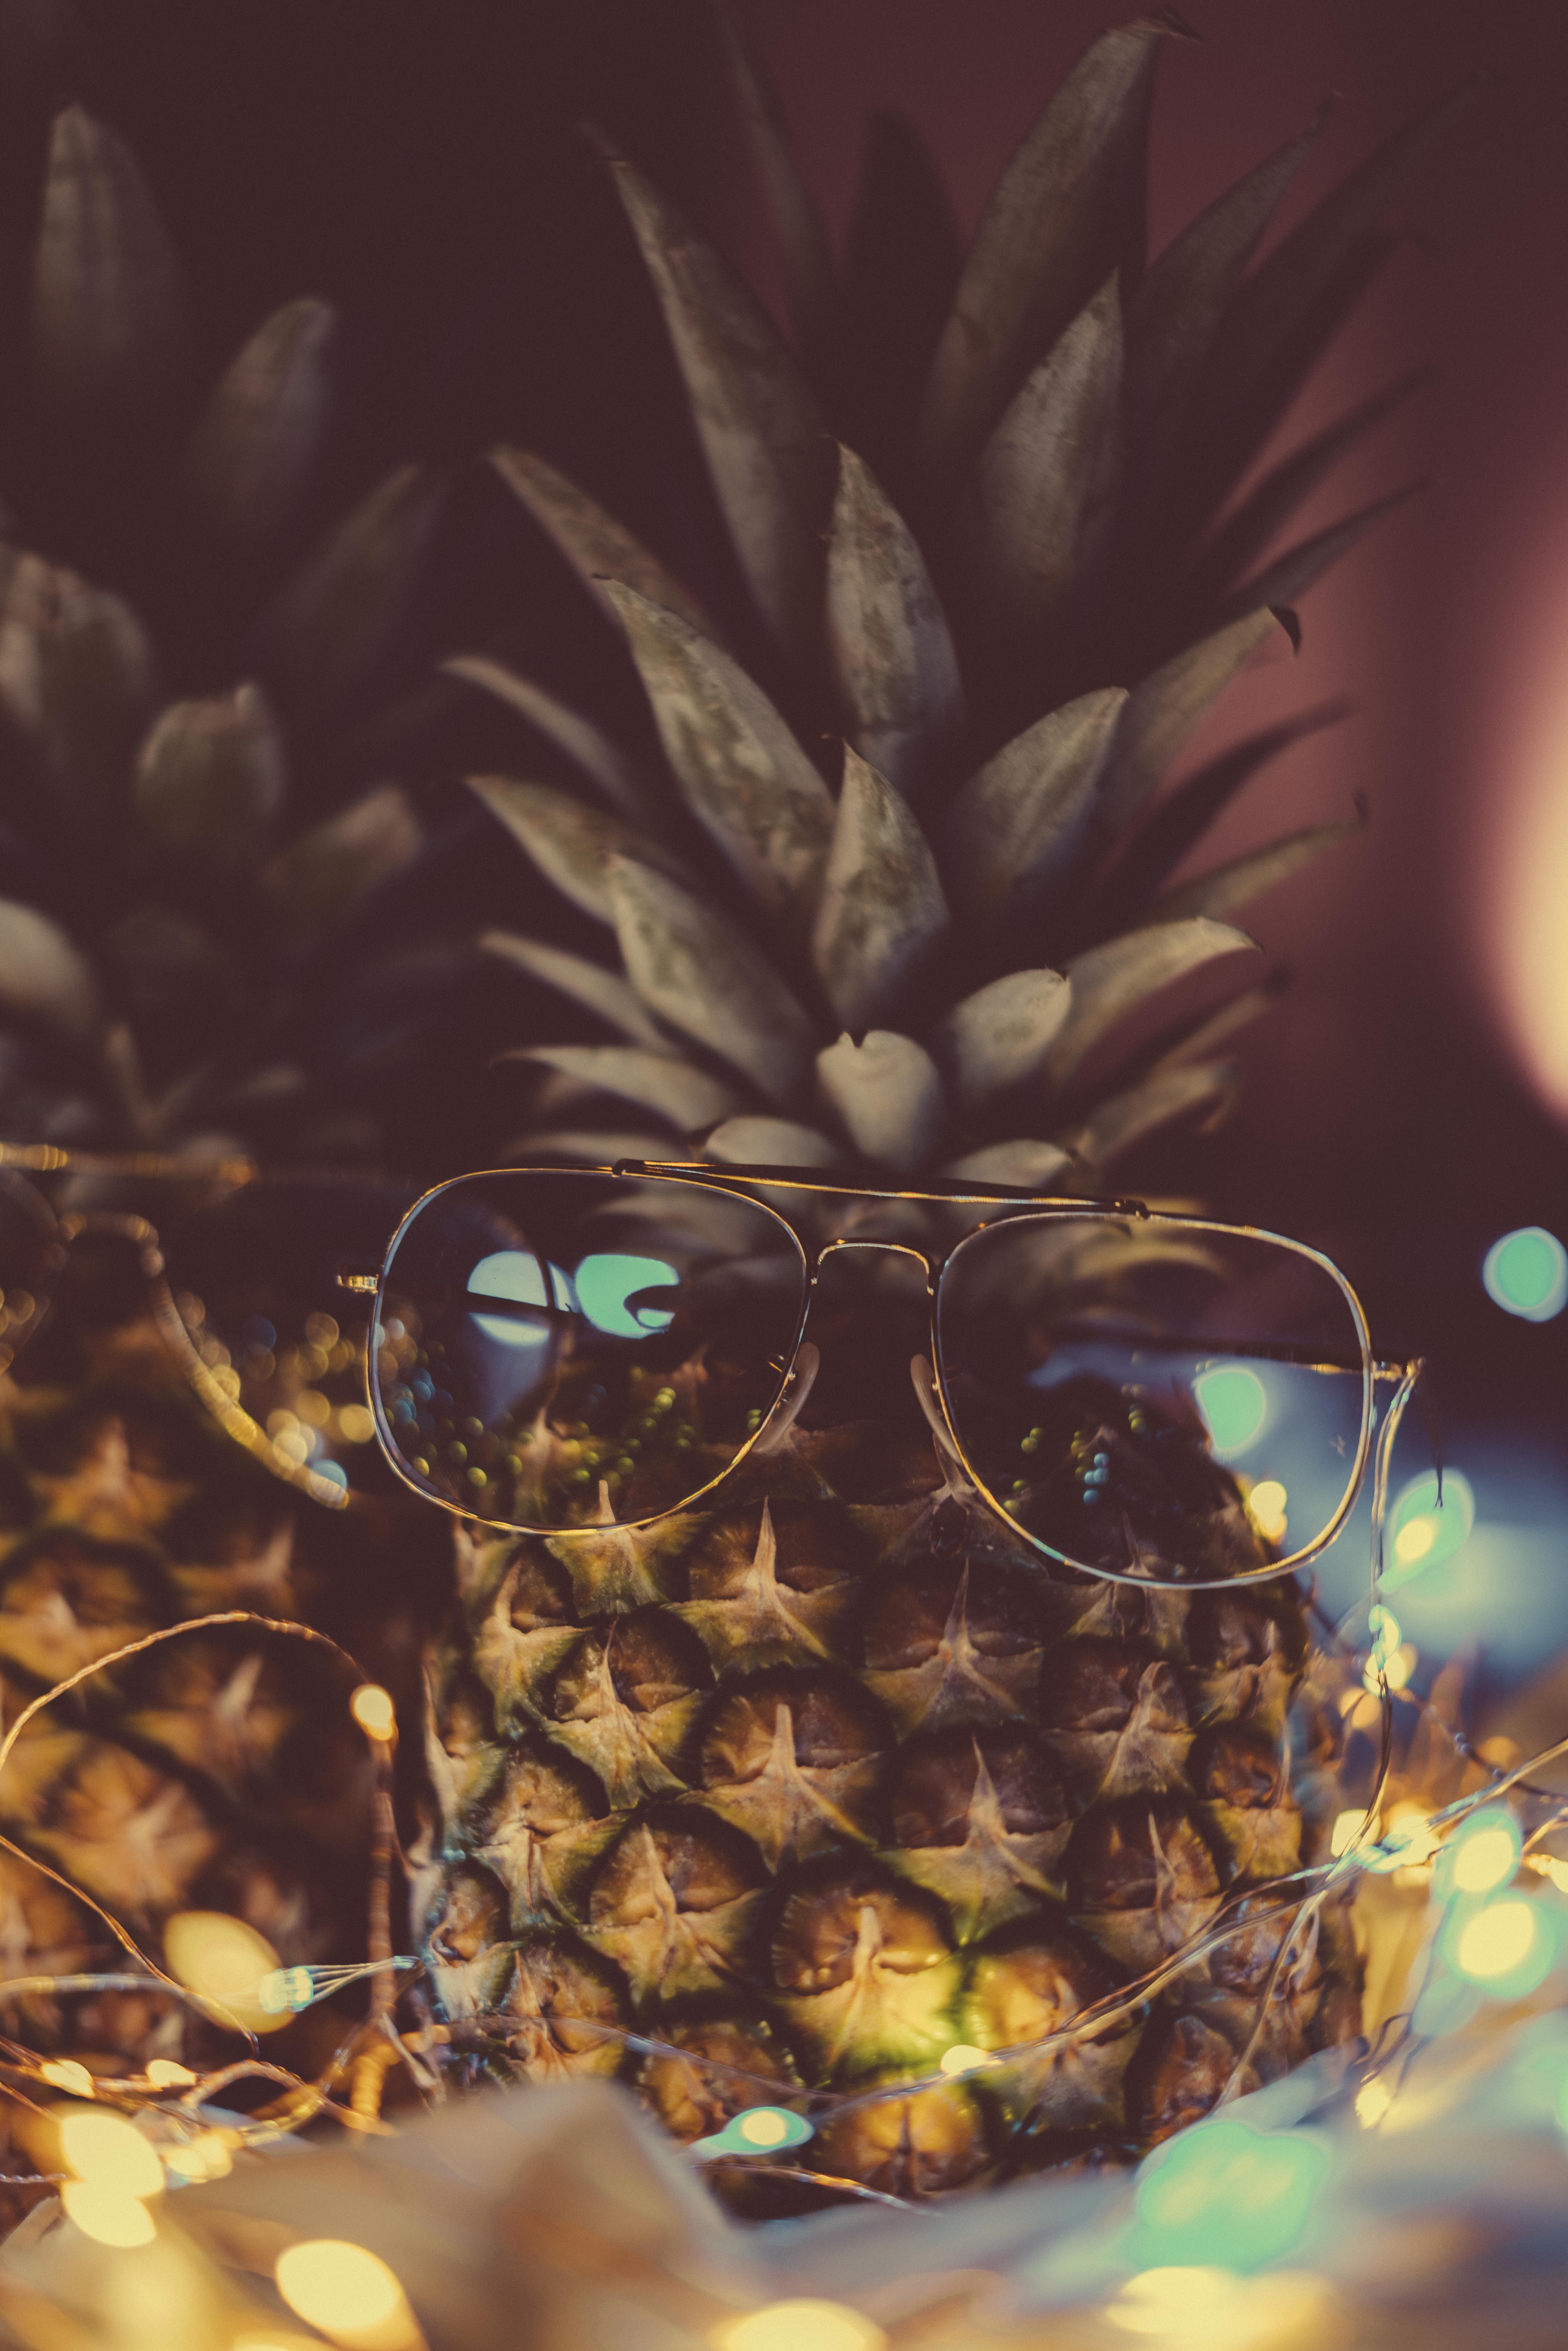 eyeglasses with frames on pineapple